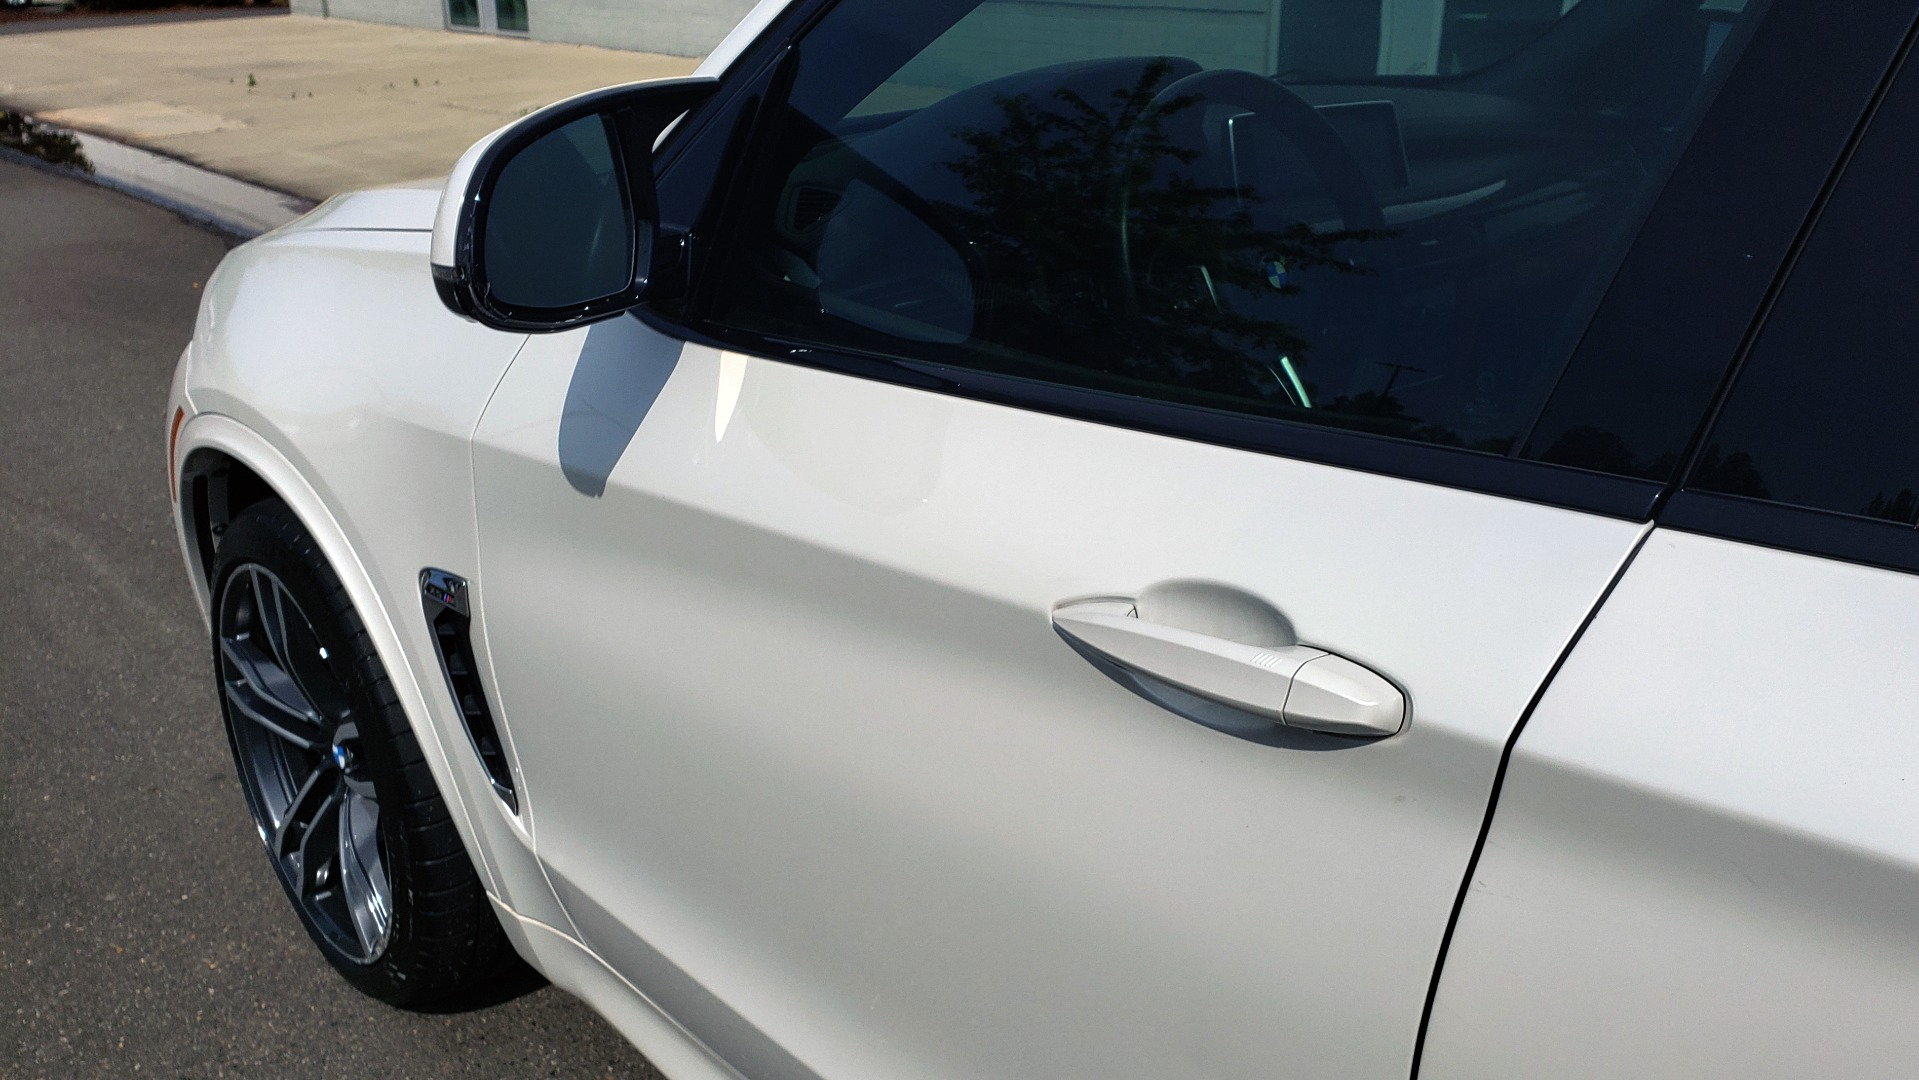 Used 2017 BMW X5 M EXECUTIVE PKG / NAV / DRVR ASST / BSM / HUD / HTD STS / WIFI for sale Sold at Formula Imports in Charlotte NC 28227 9